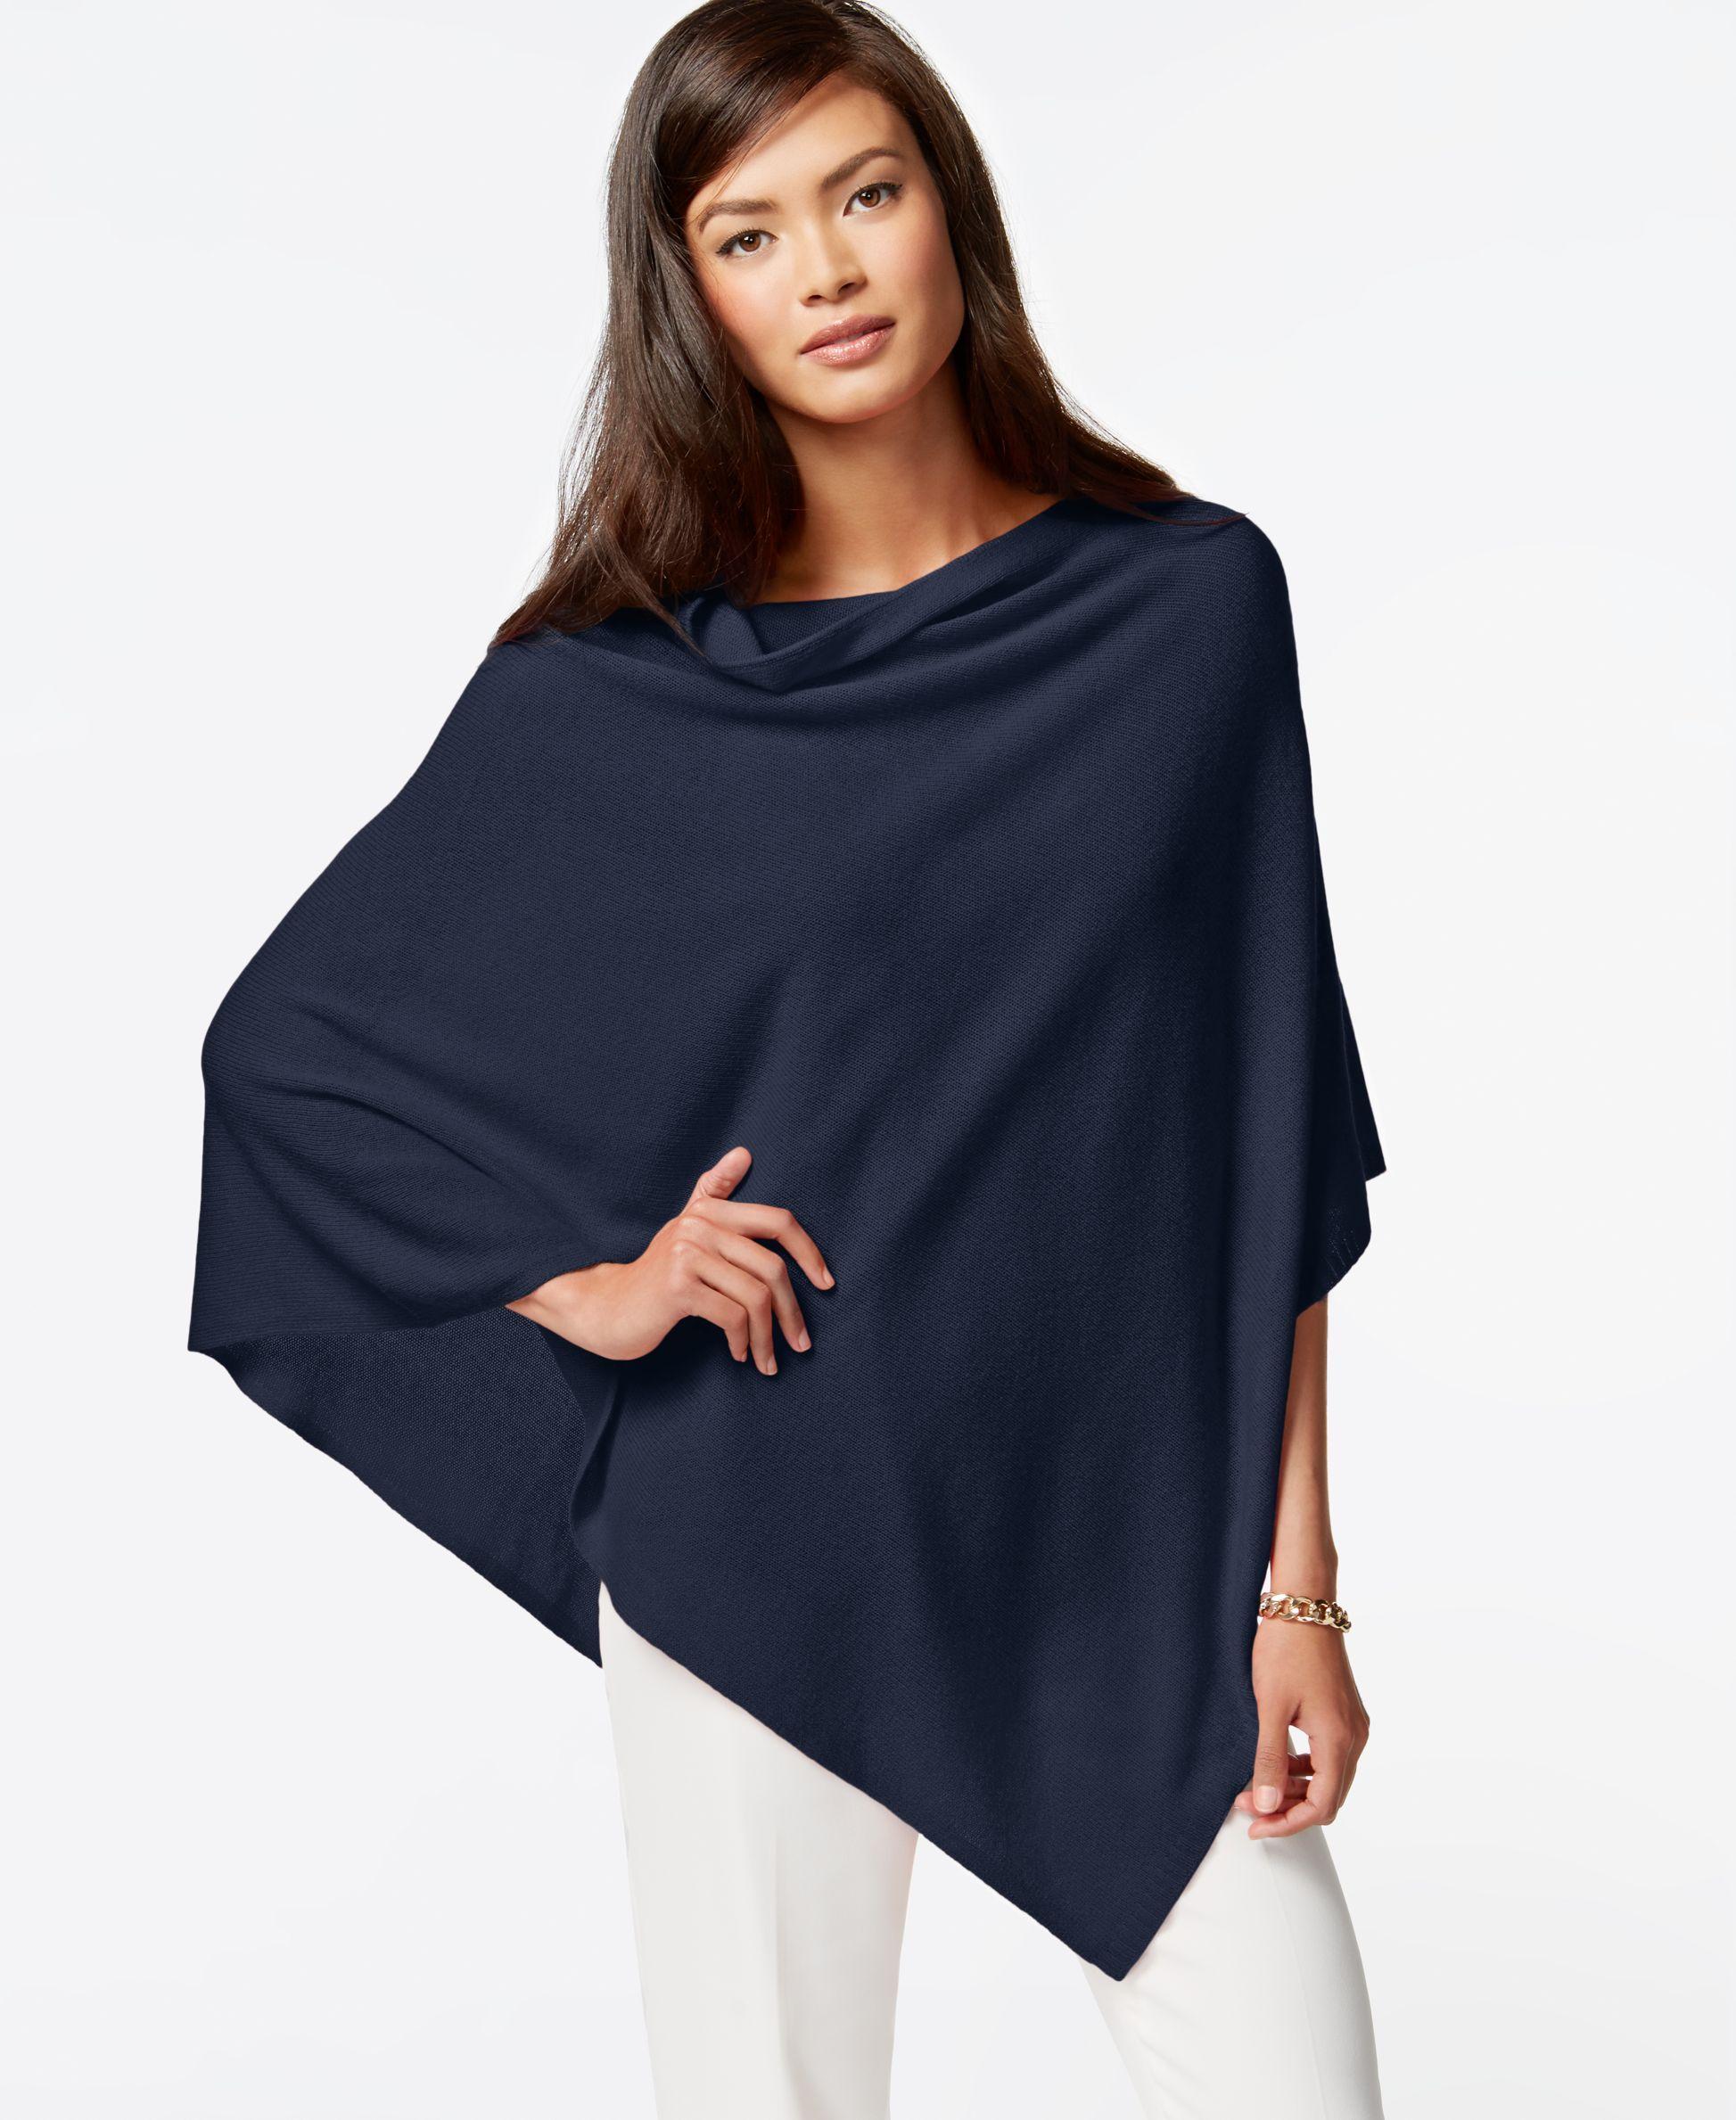 da3ff00ab Charter Club Cashmere Poncho Sweater   Products   Cashmere poncho ...